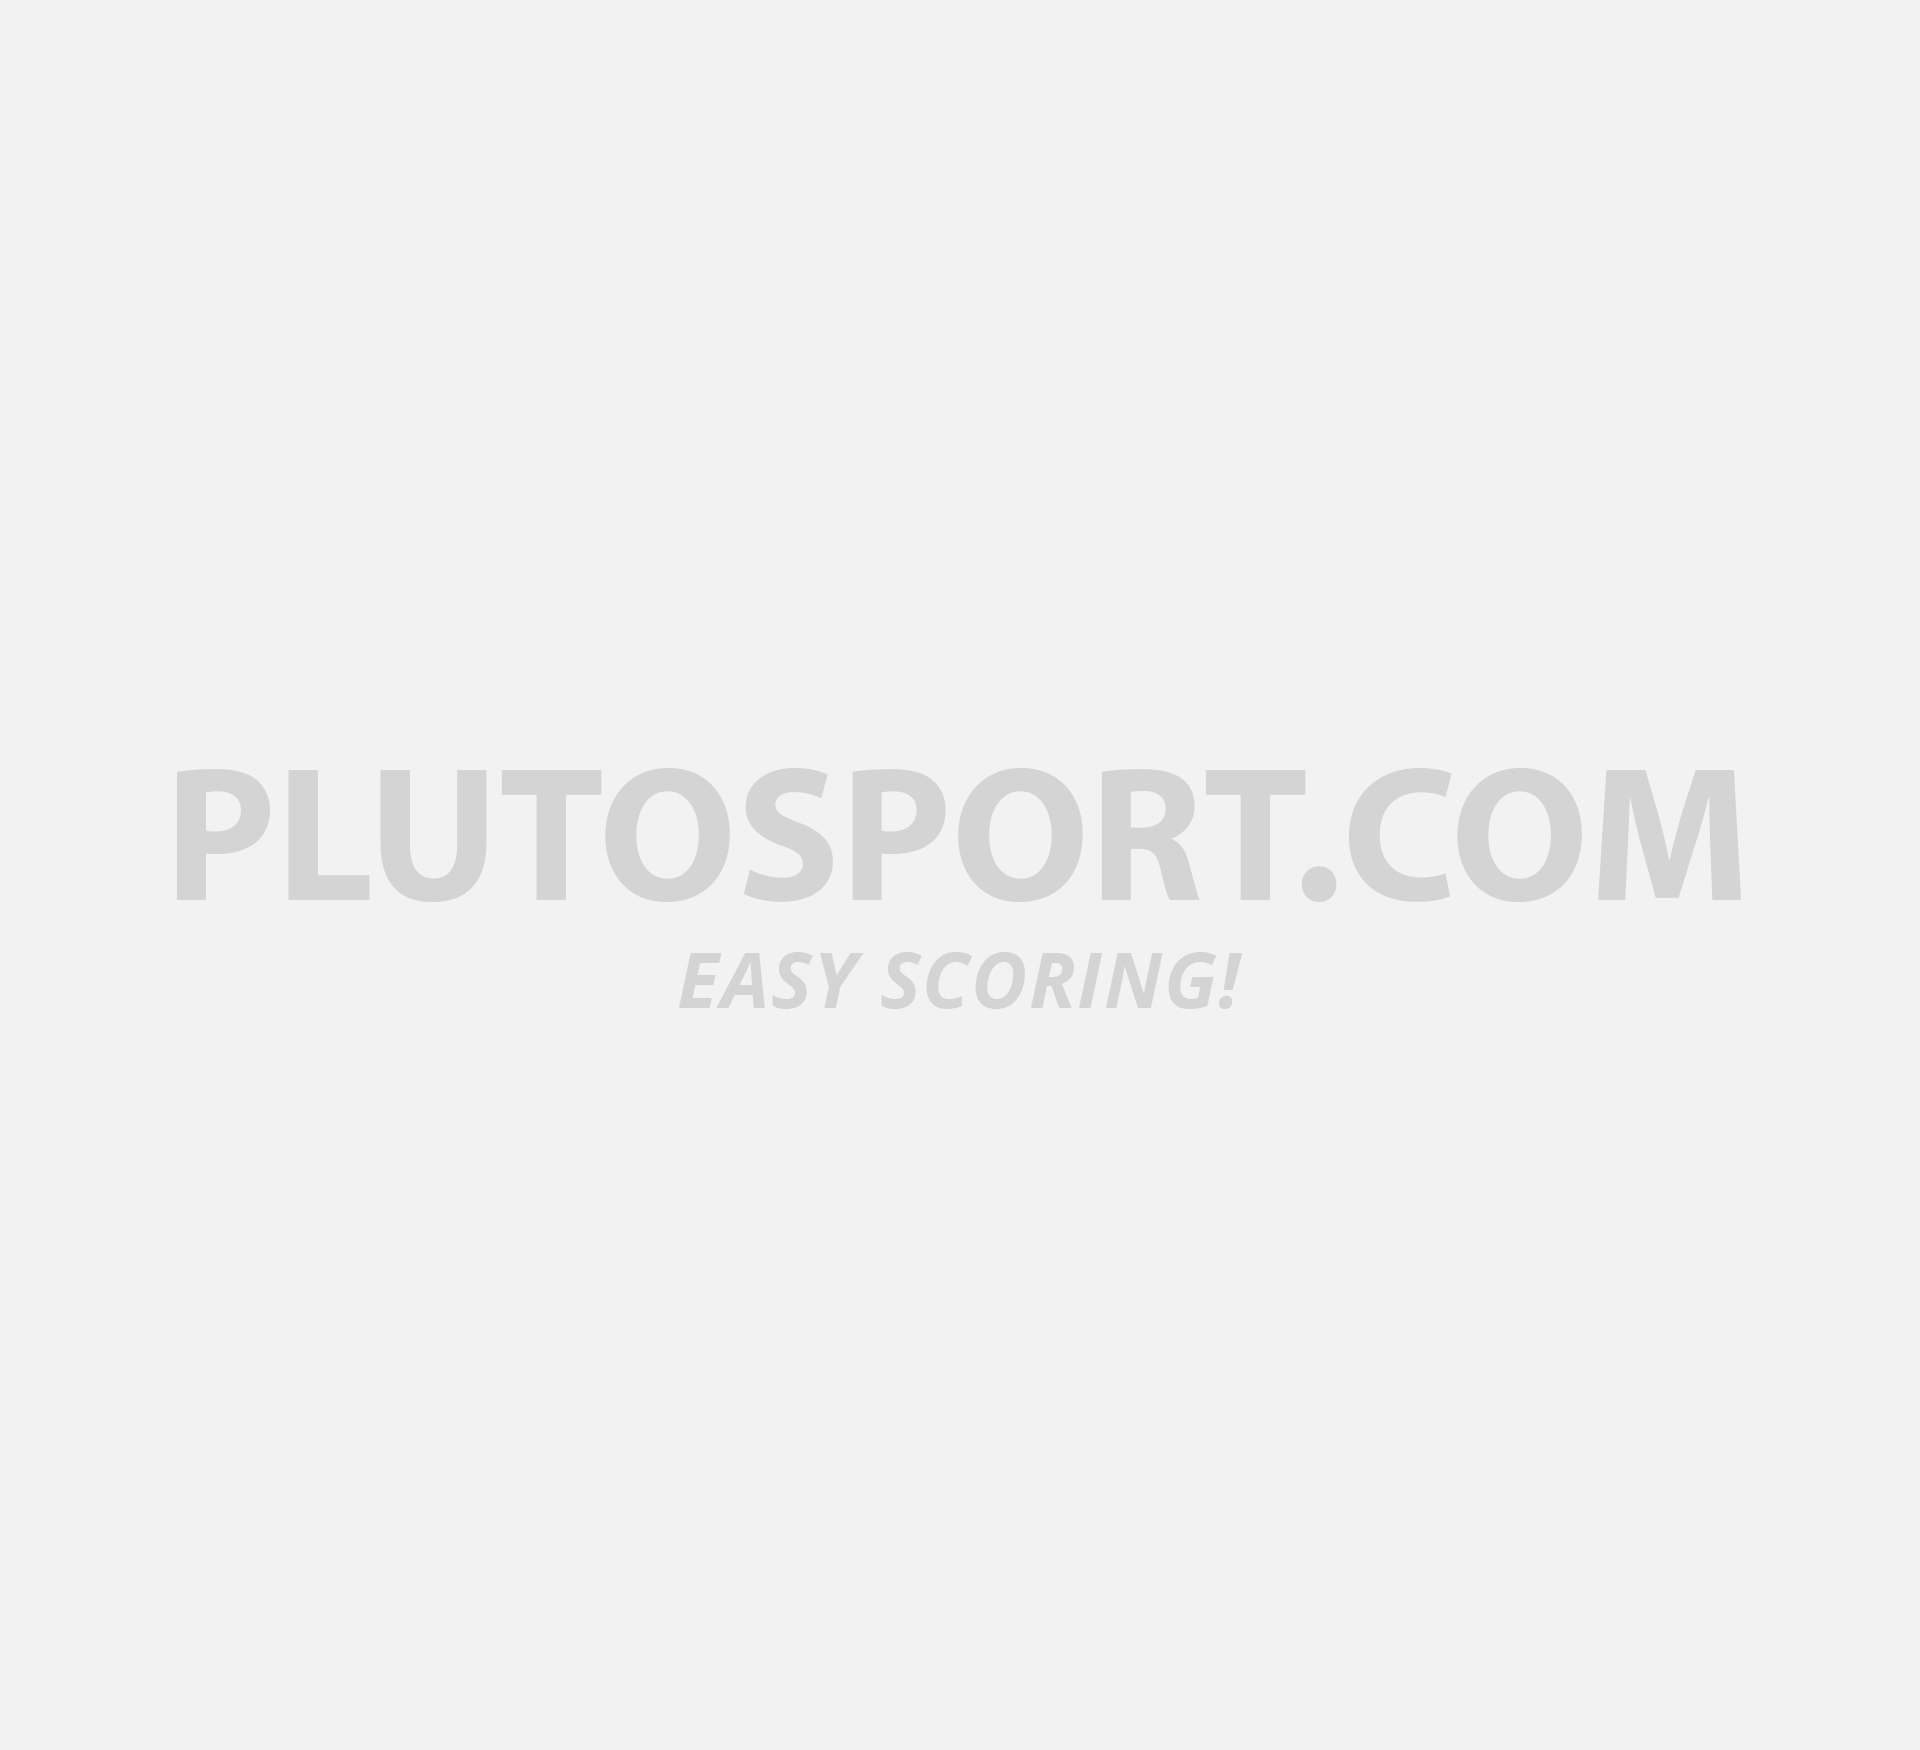 Adidas Varial Mid J - Sneakers - Shoes - Lifestyle - Sports   Plutosport 0e6e3d1e6c02